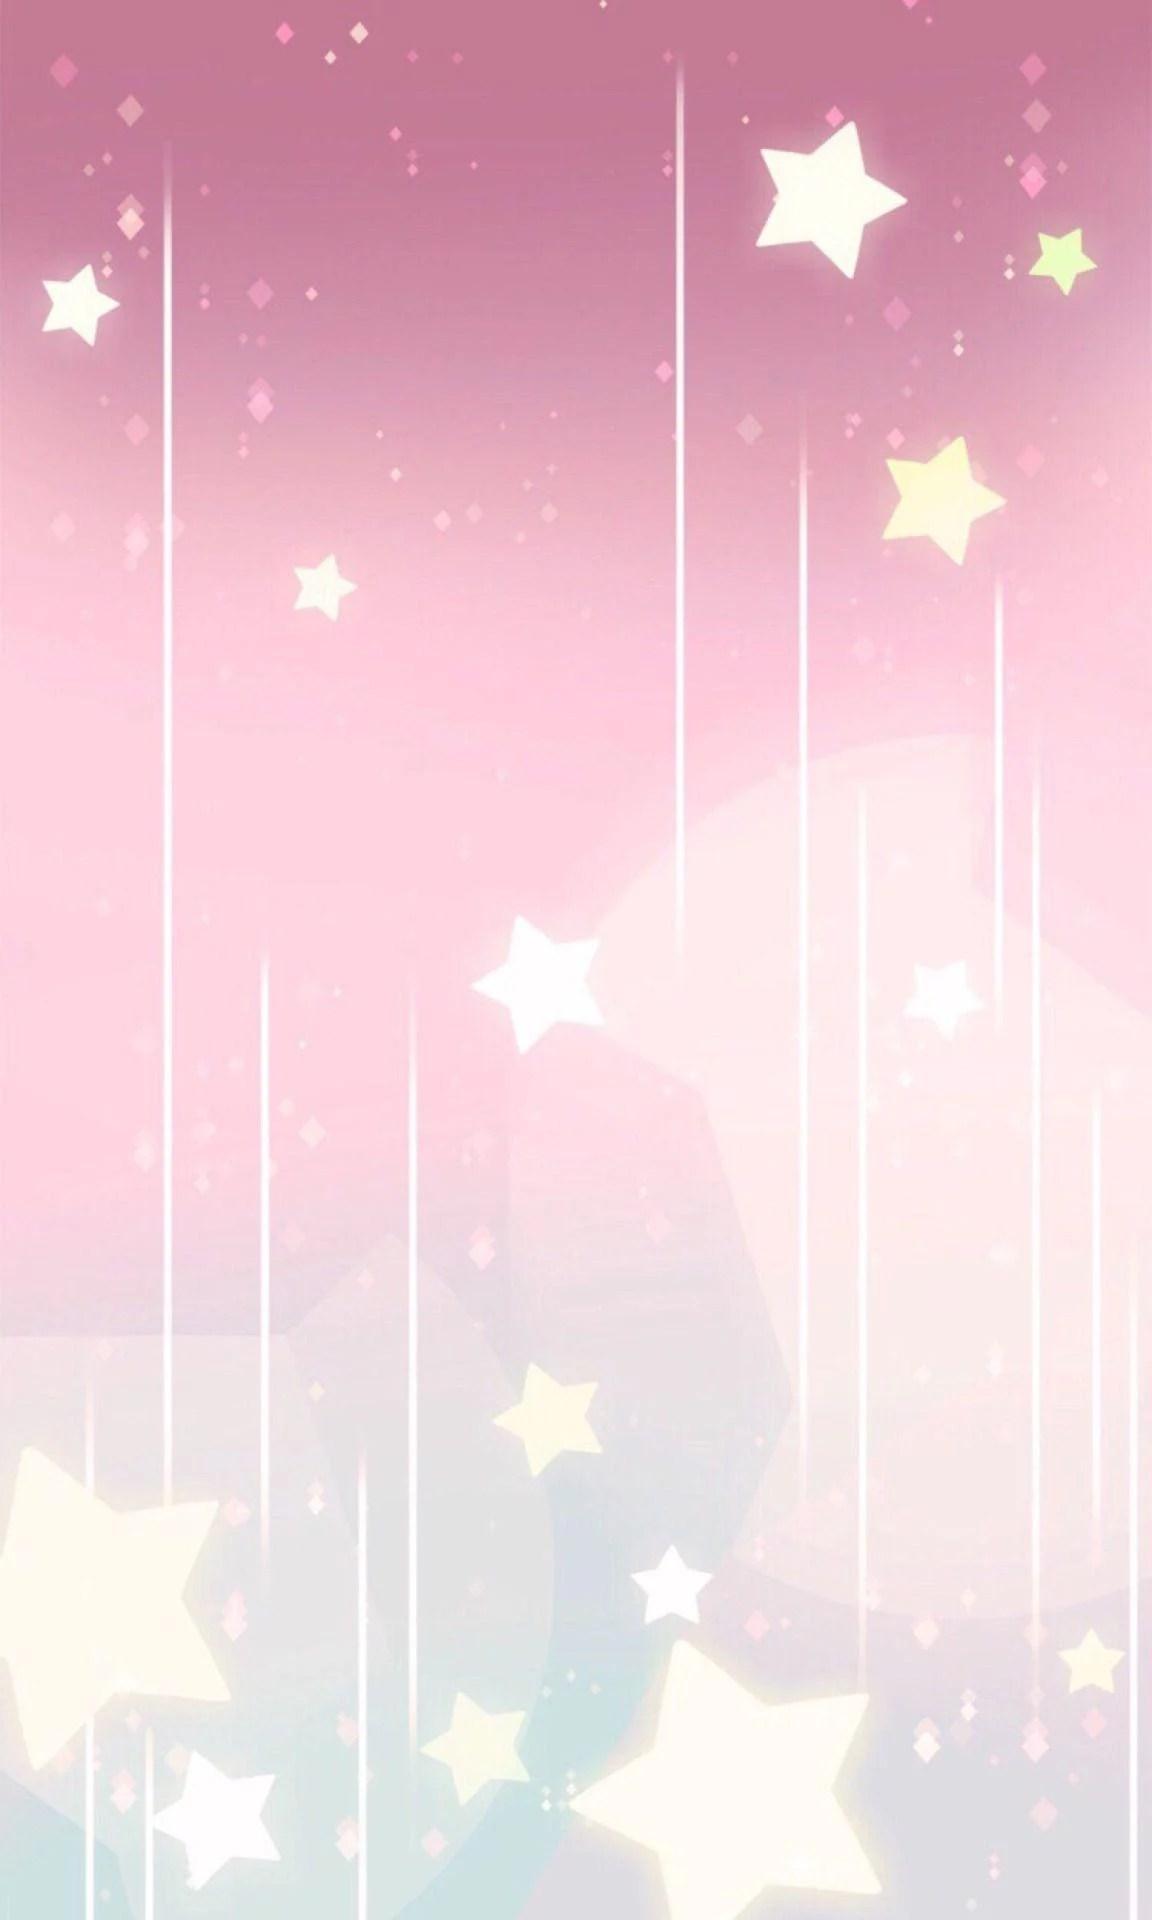 Aesthetic Cute Pink Whatsapp Wallpaper ...